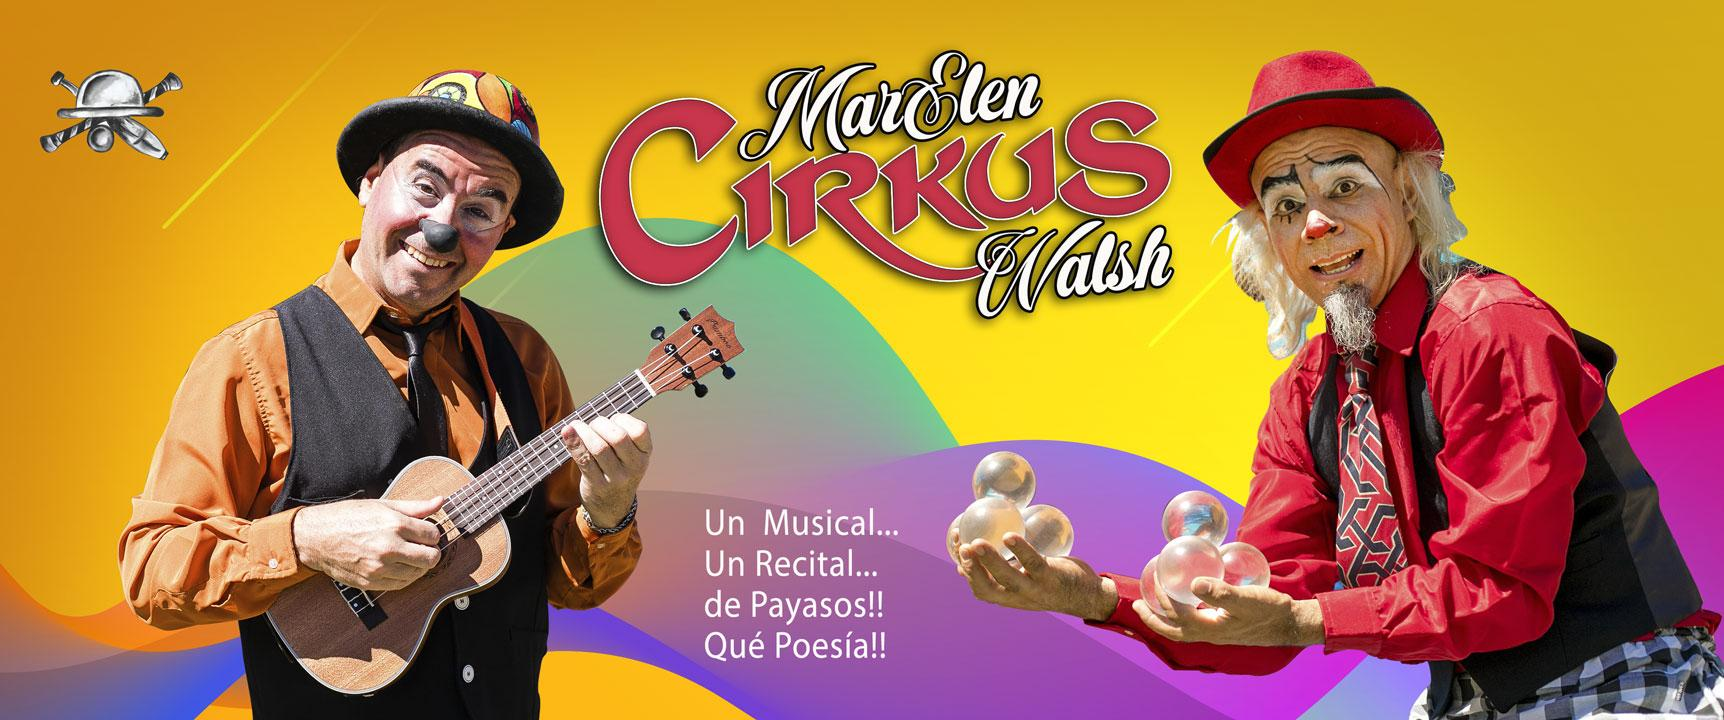 MarElen Cirkus Walsh